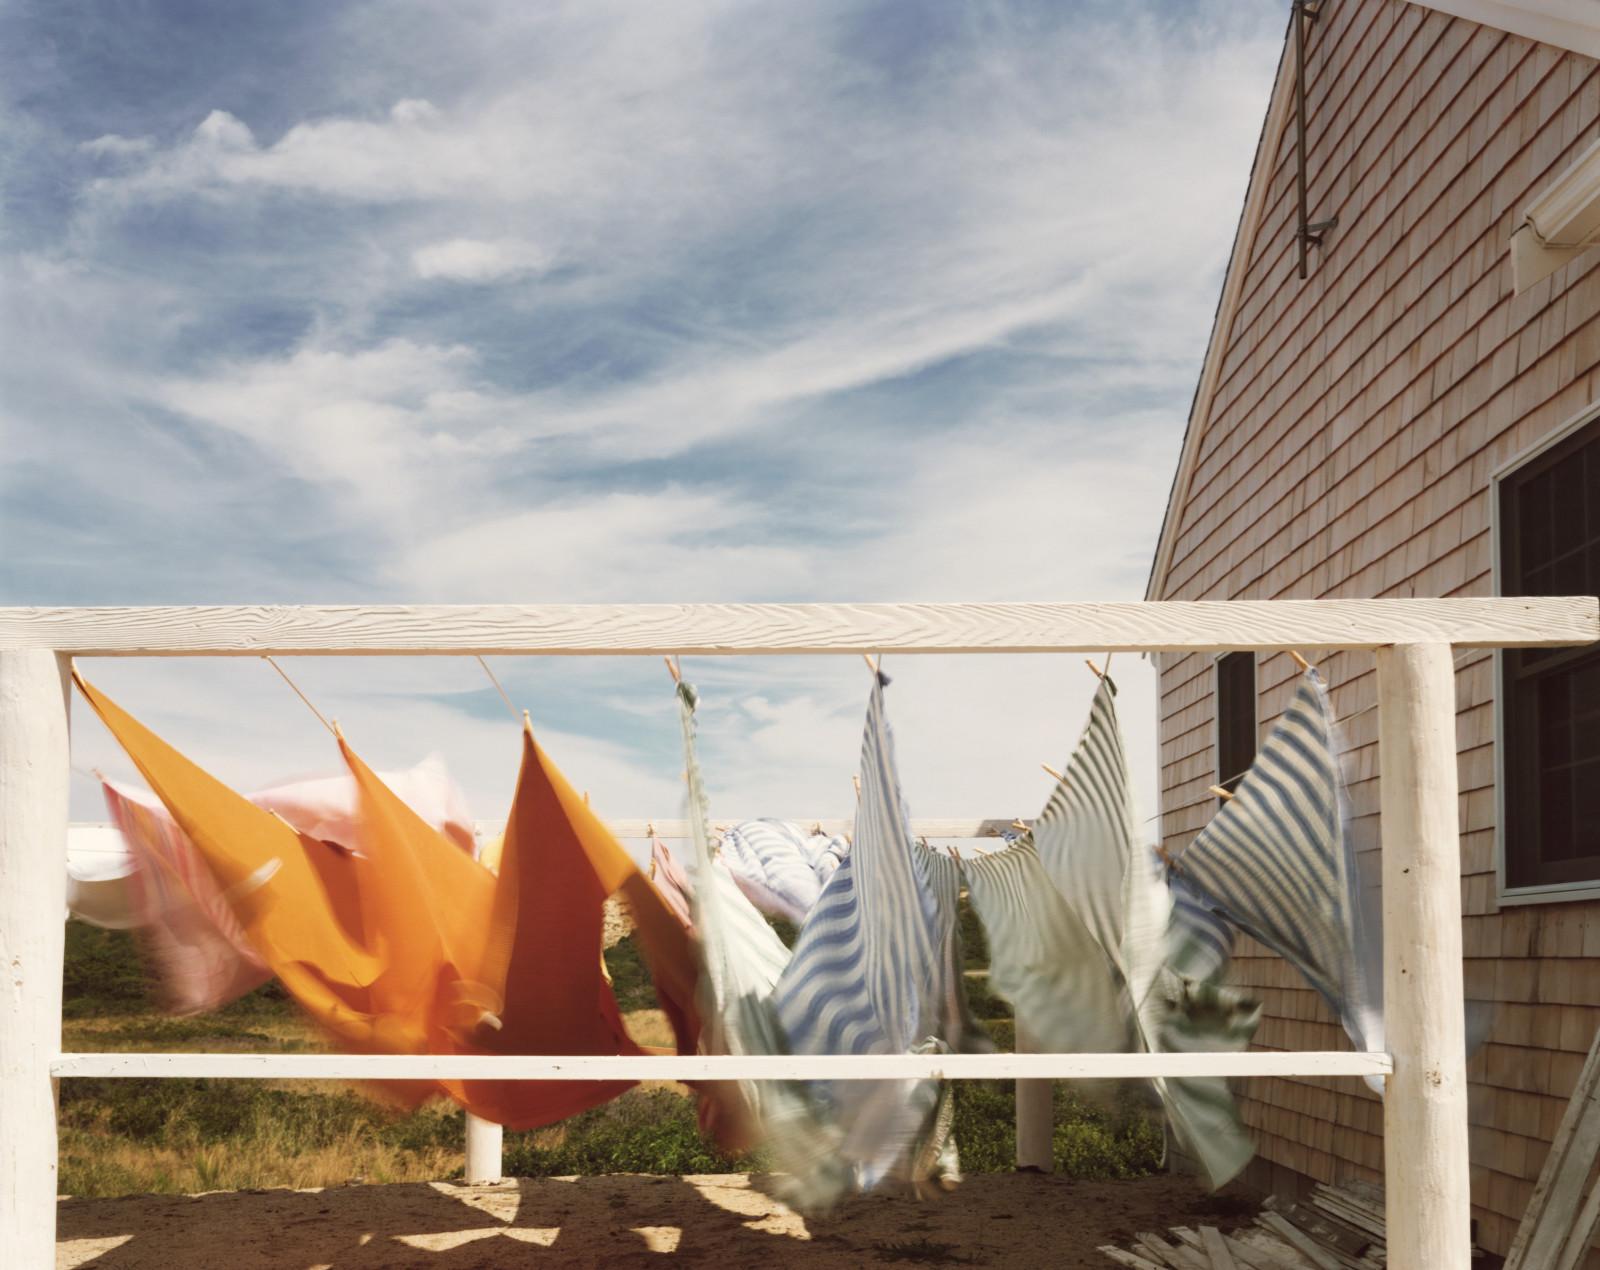 Laundry, Cape Cod, 1982